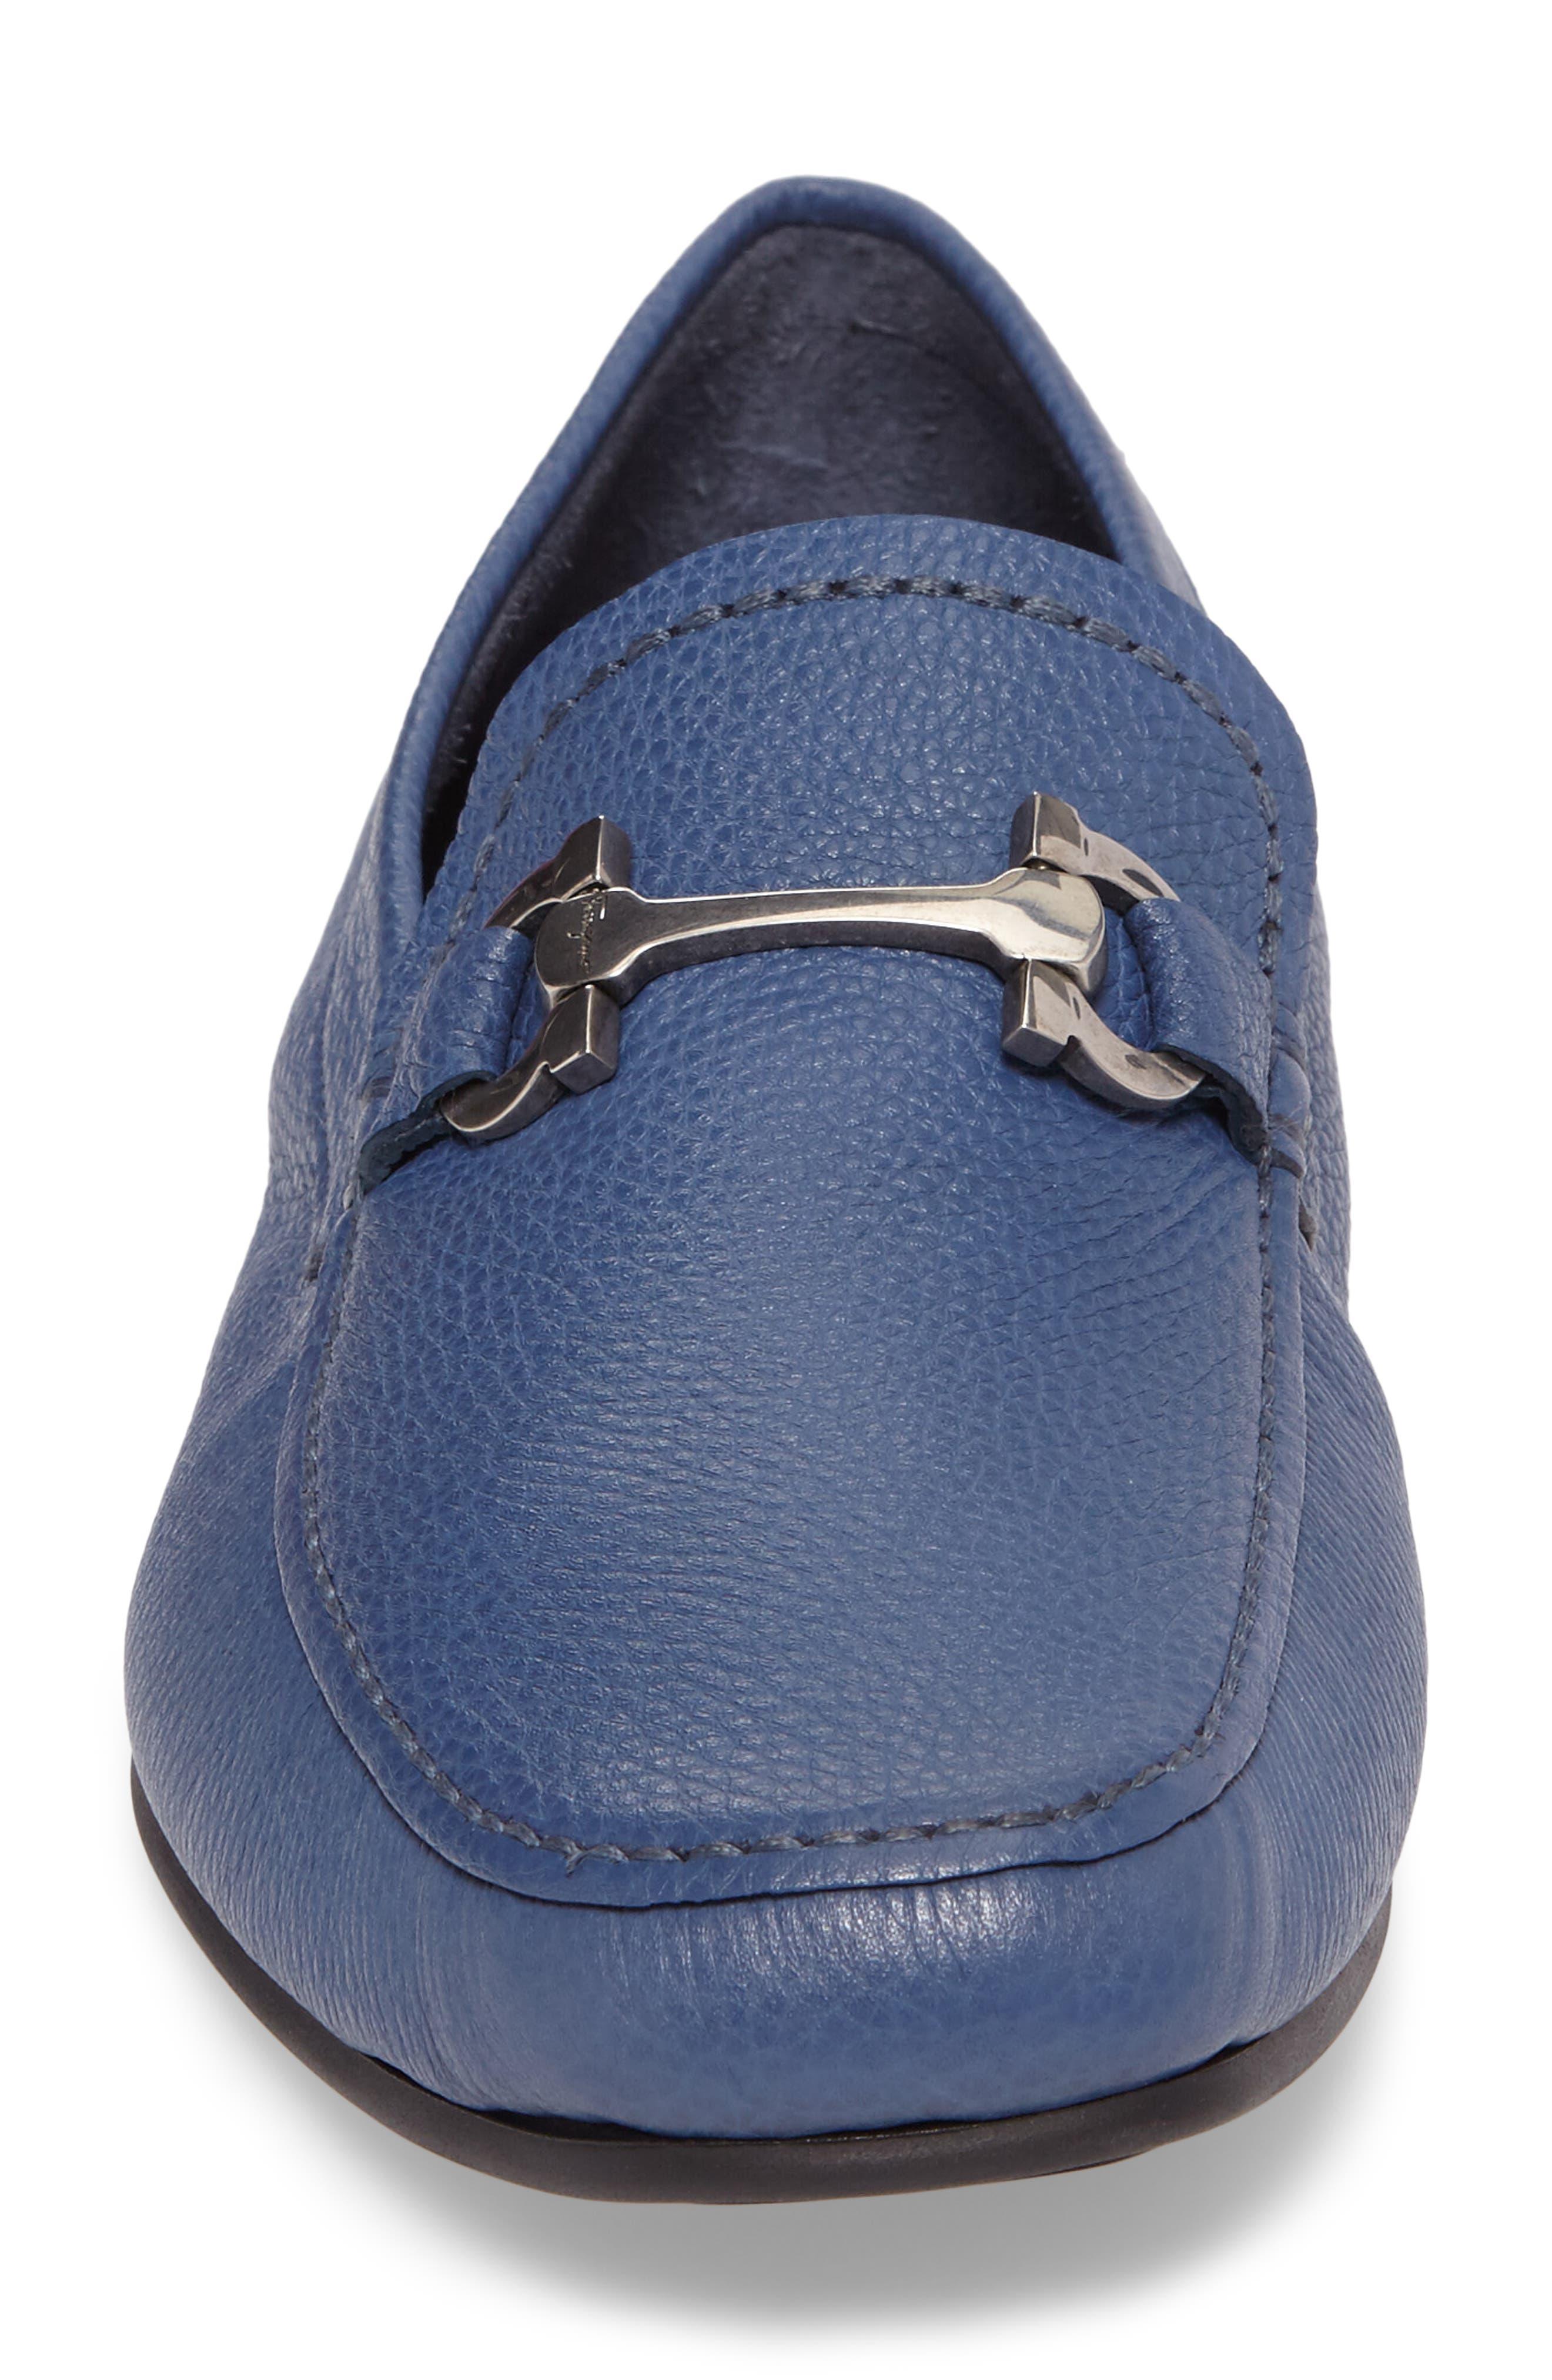 Cancun 2 Driving Shoe,                             Alternate thumbnail 4, color,                             Fjord Blue